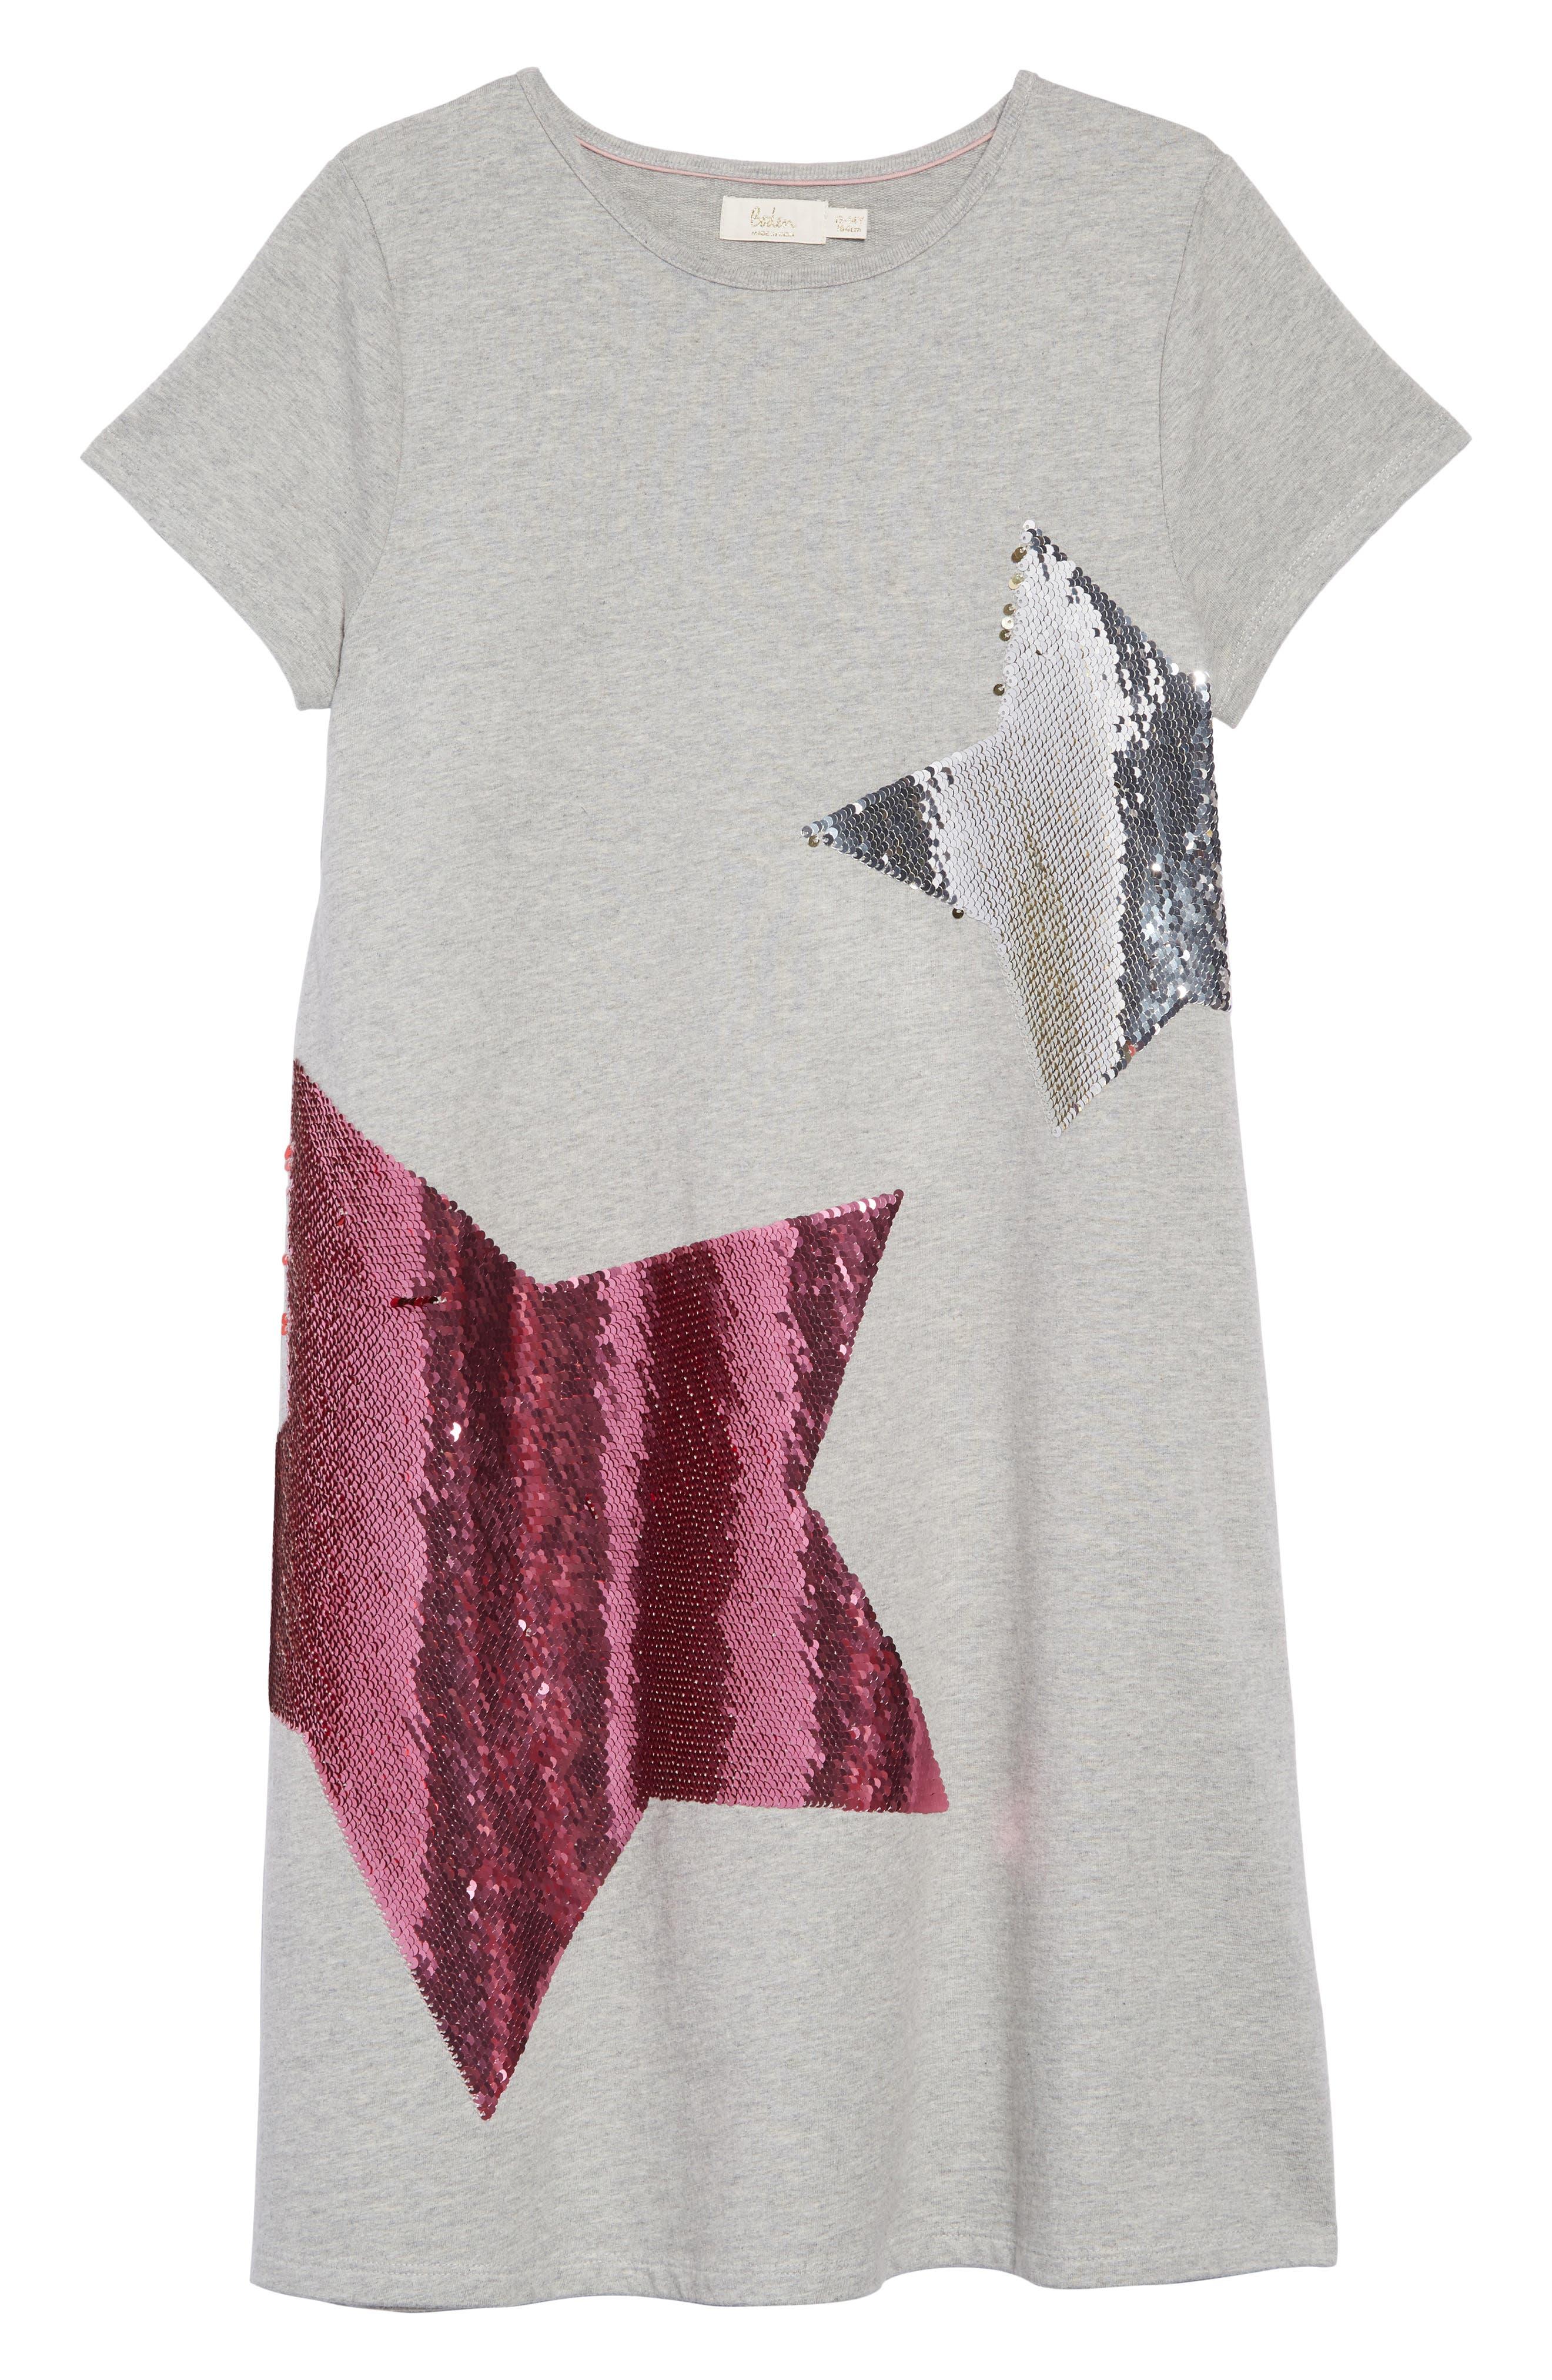 Shimmer Flip Sequin Star T-Shirt Dress,                             Main thumbnail 1, color,                             GRY GREY MARL/ RAINBOW SEQUINS